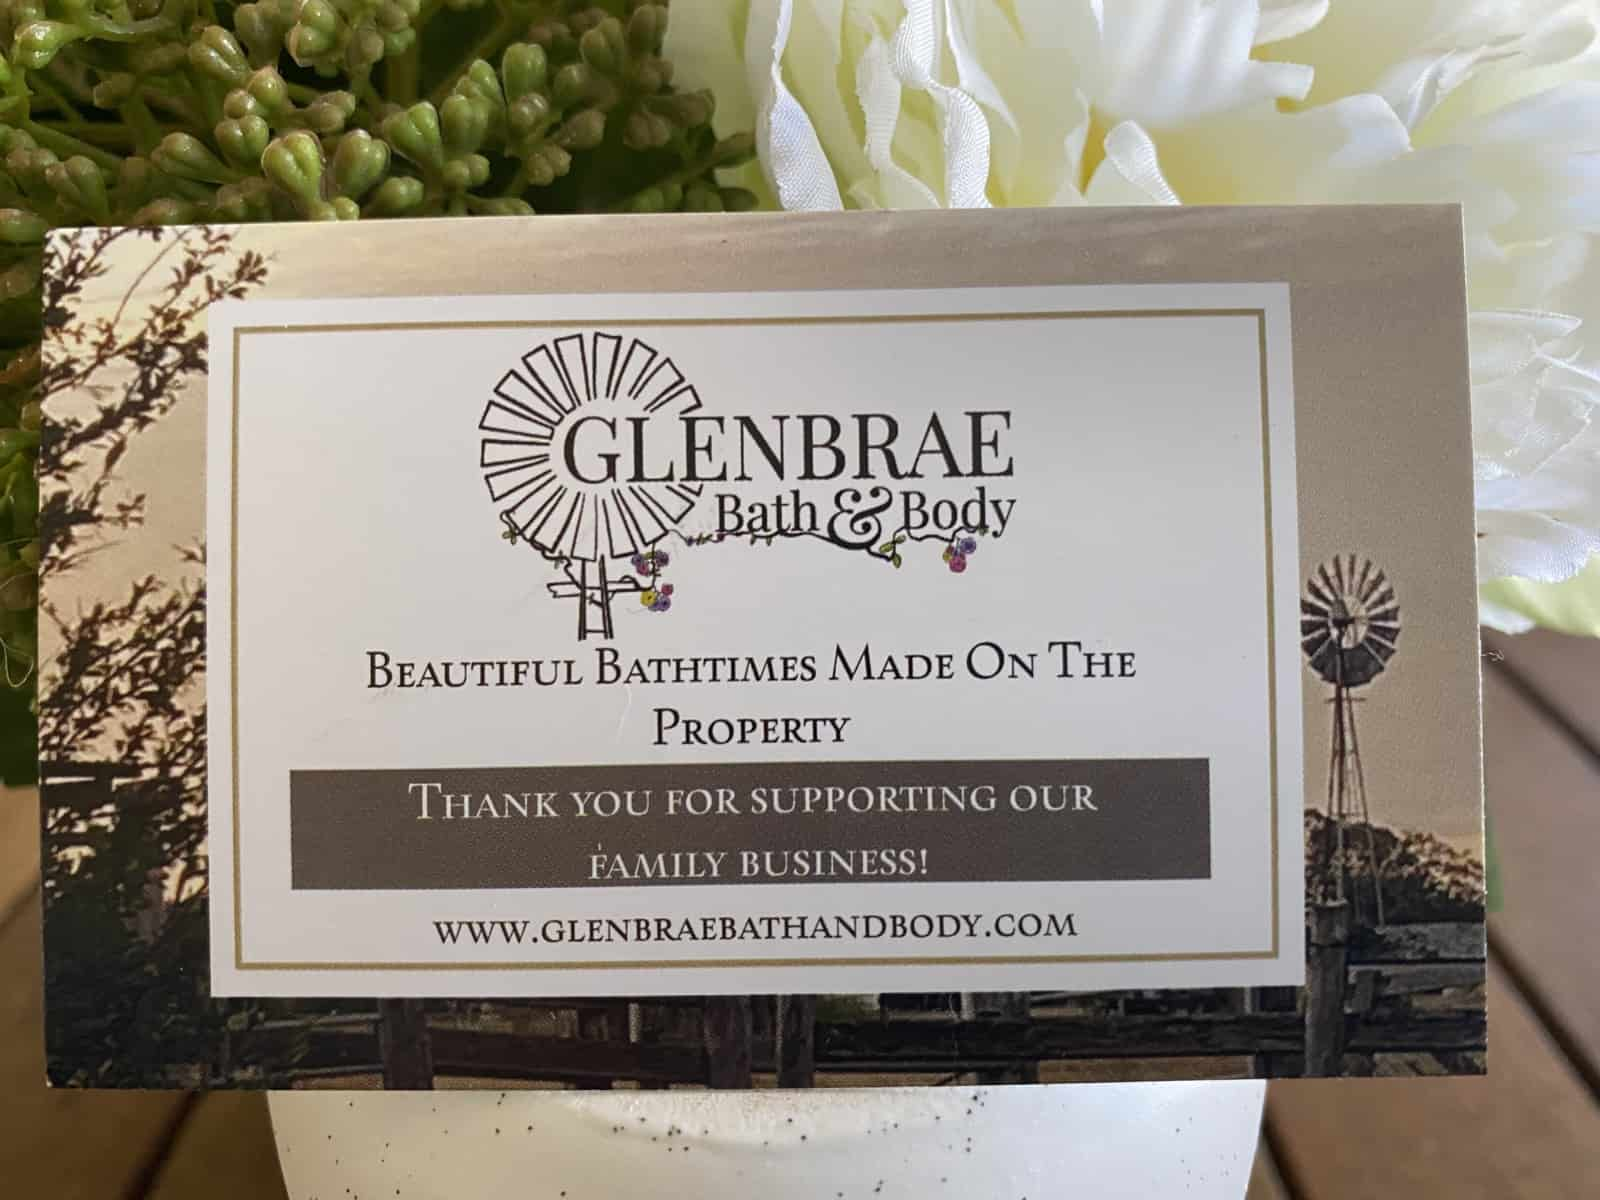 Glenbrae Bath and Body